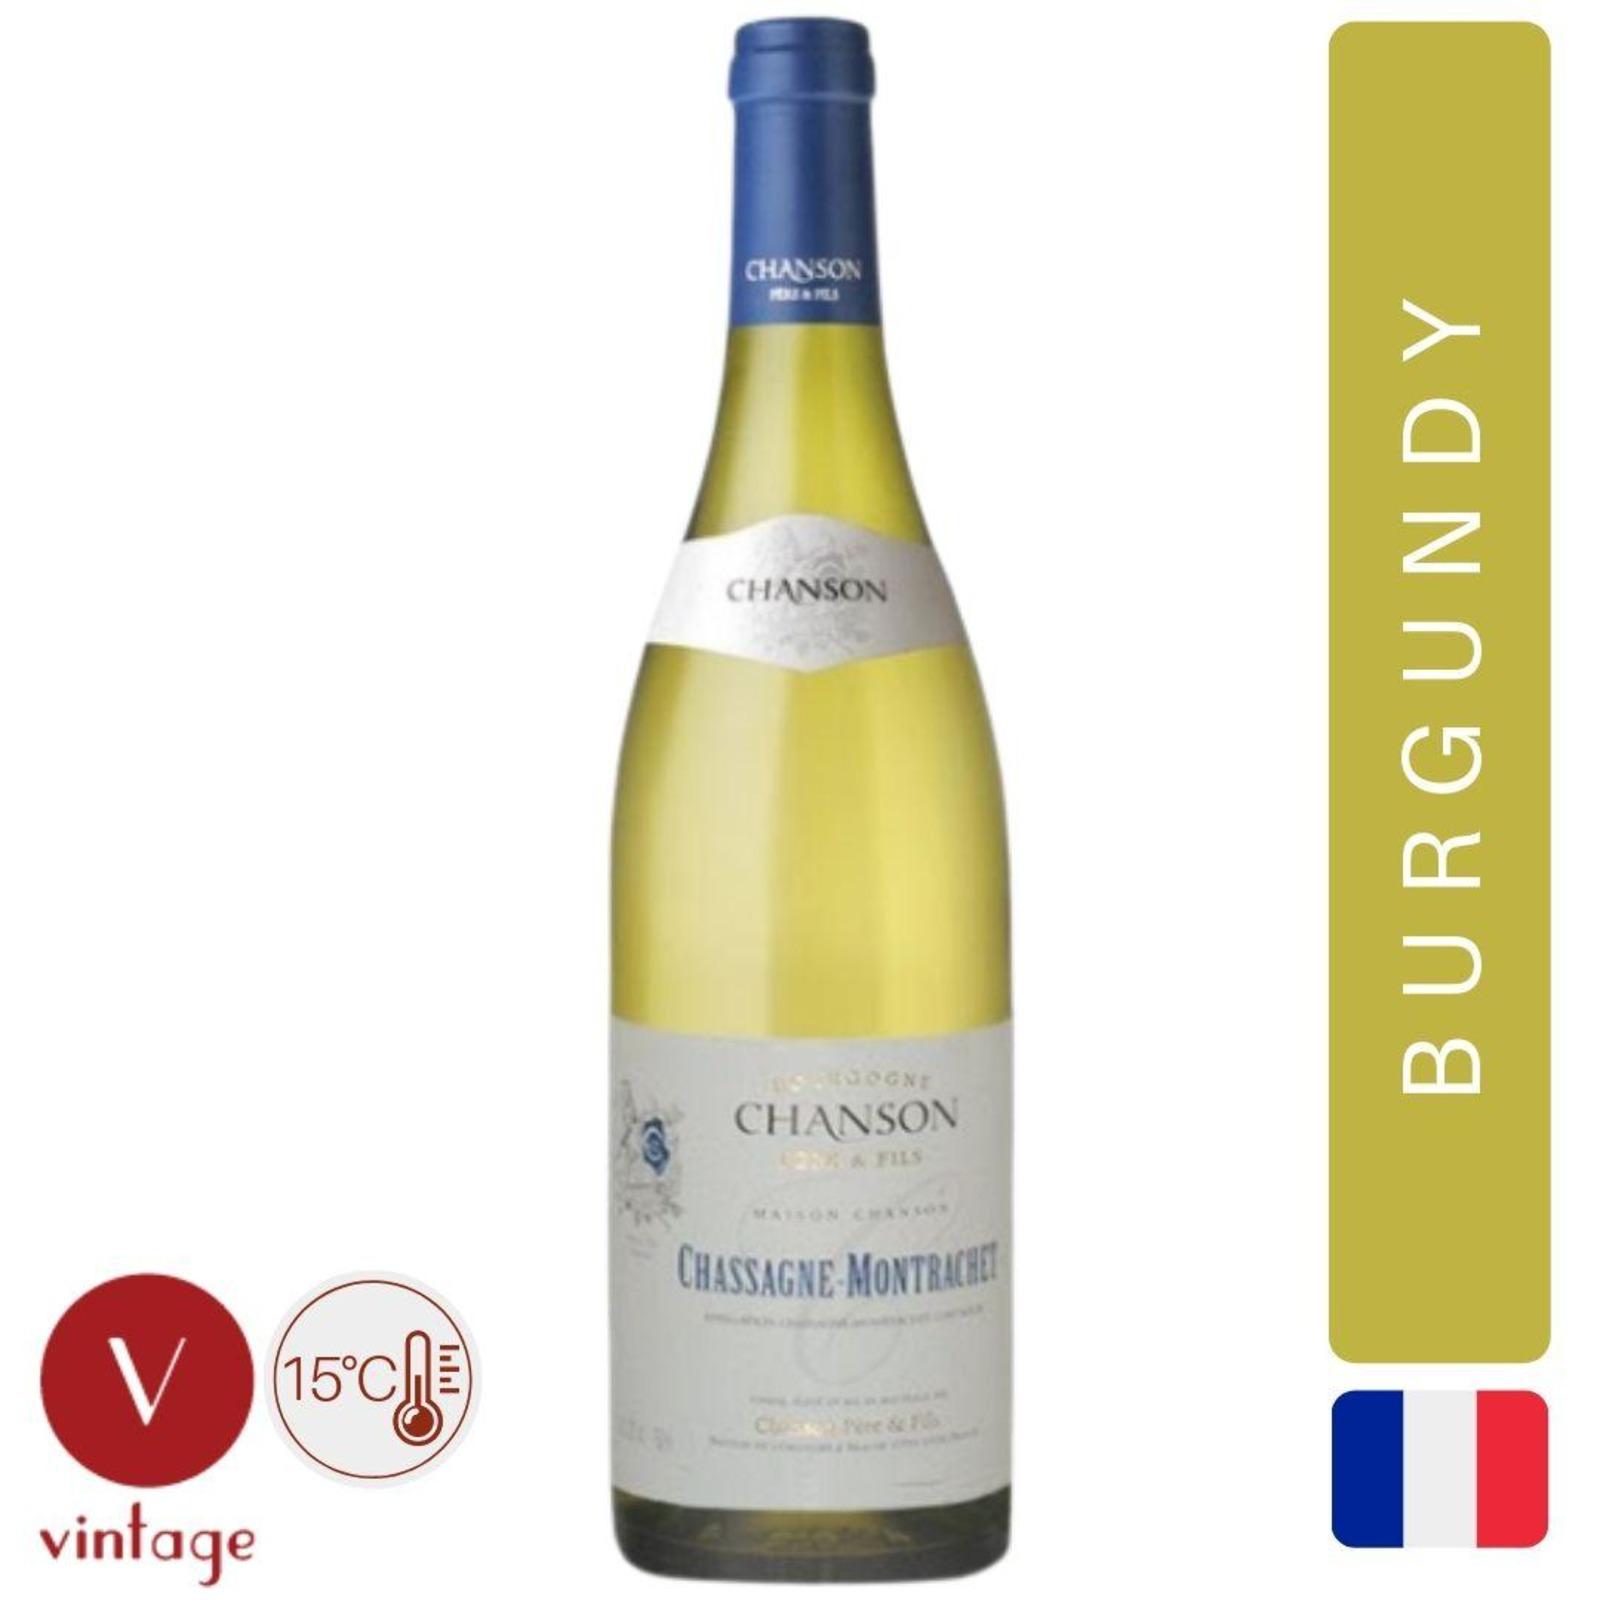 Domaine Chanson - Chassagne-Montrachet - Burgundy White Wine